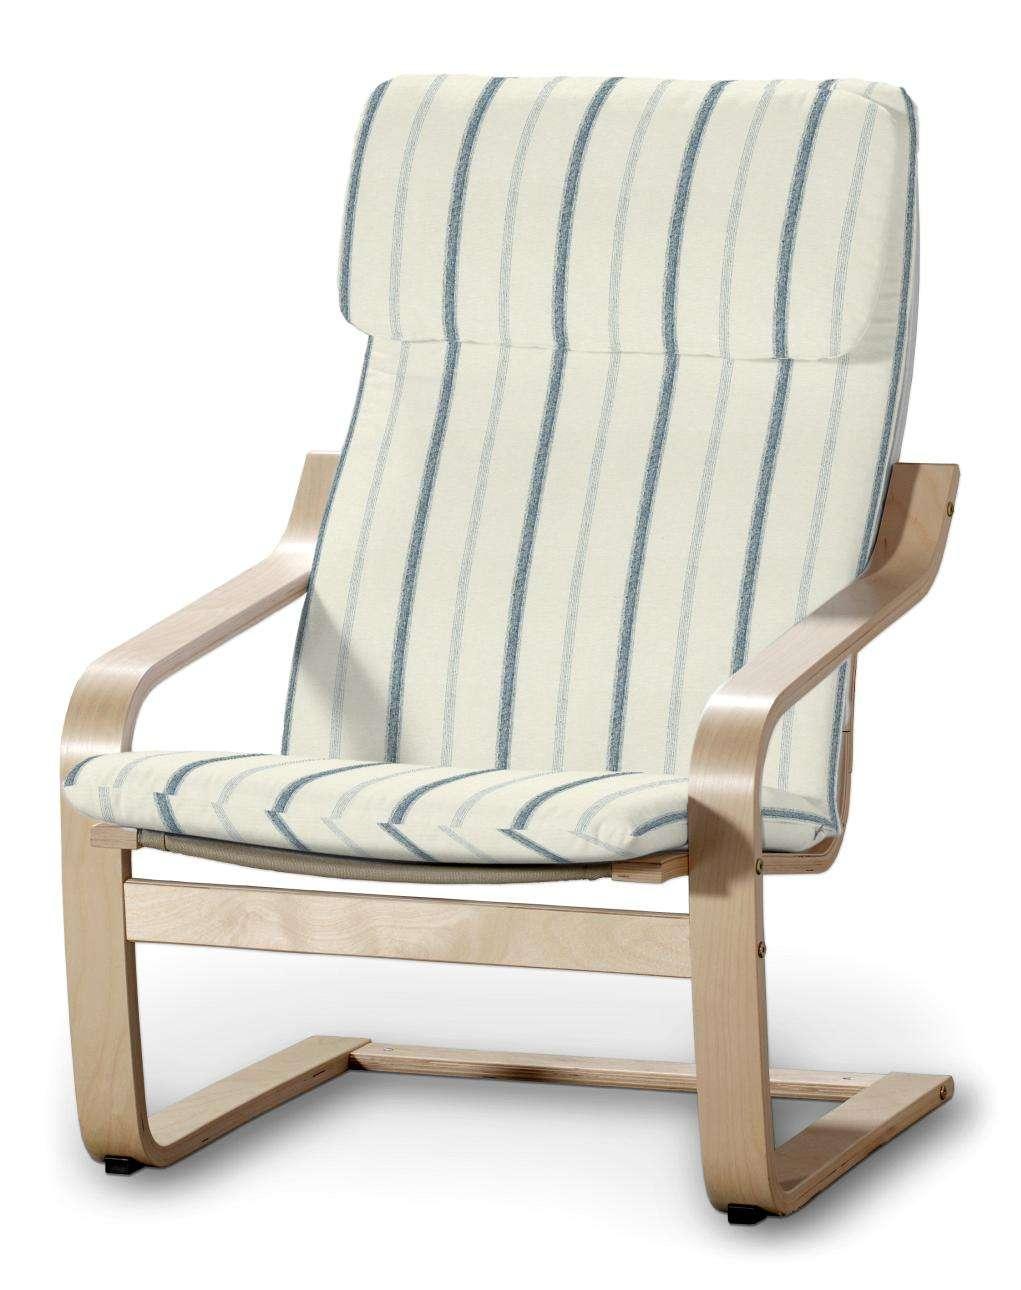 Poduszka na fotel Poäng Fotel Poäng w kolekcji Avinon, tkanina: 129-66